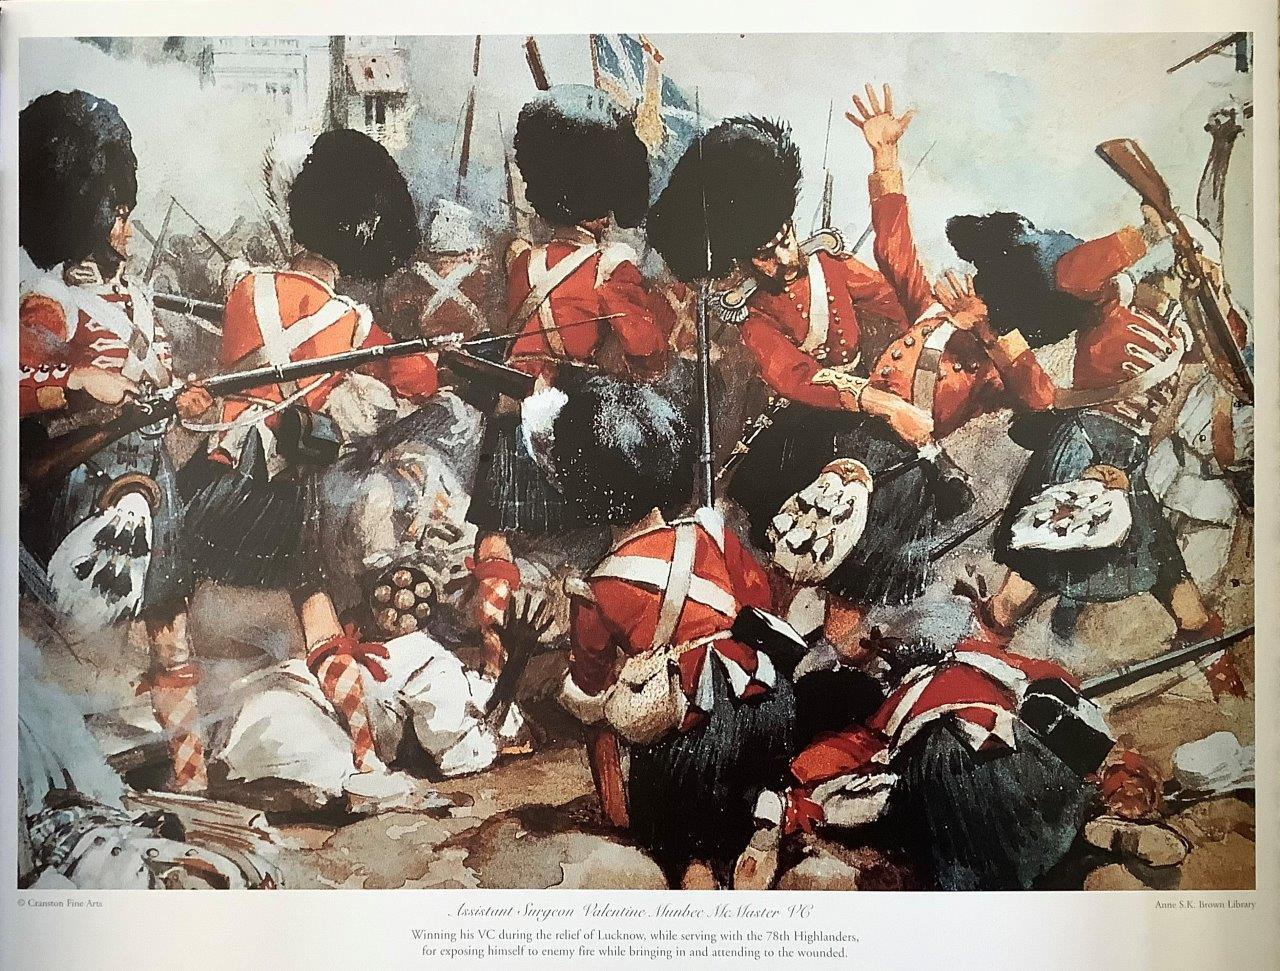 Portrait of Battle of Lucknow, 1857